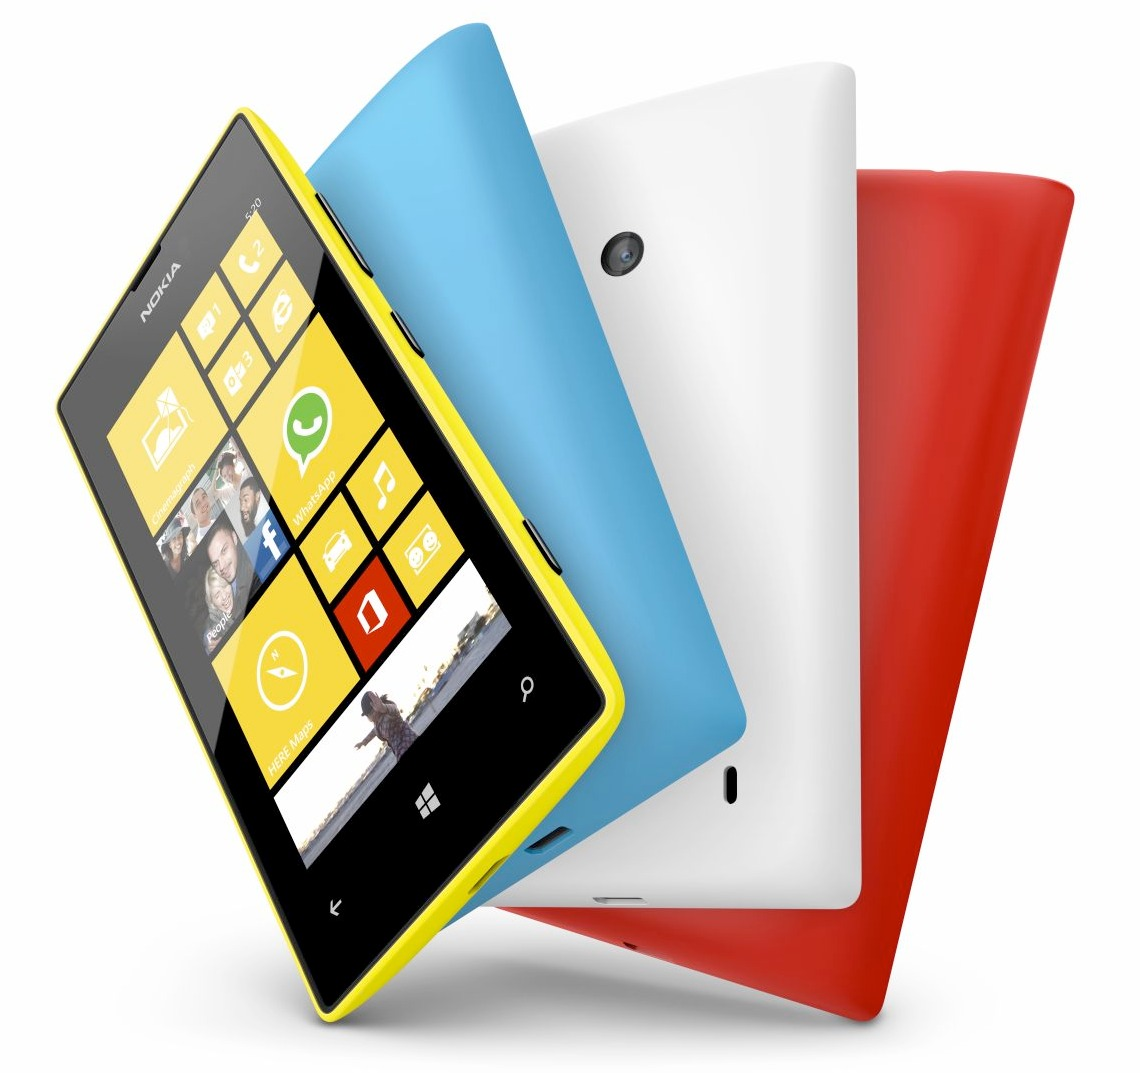 Lumia 720 e Lumia 520 revelados